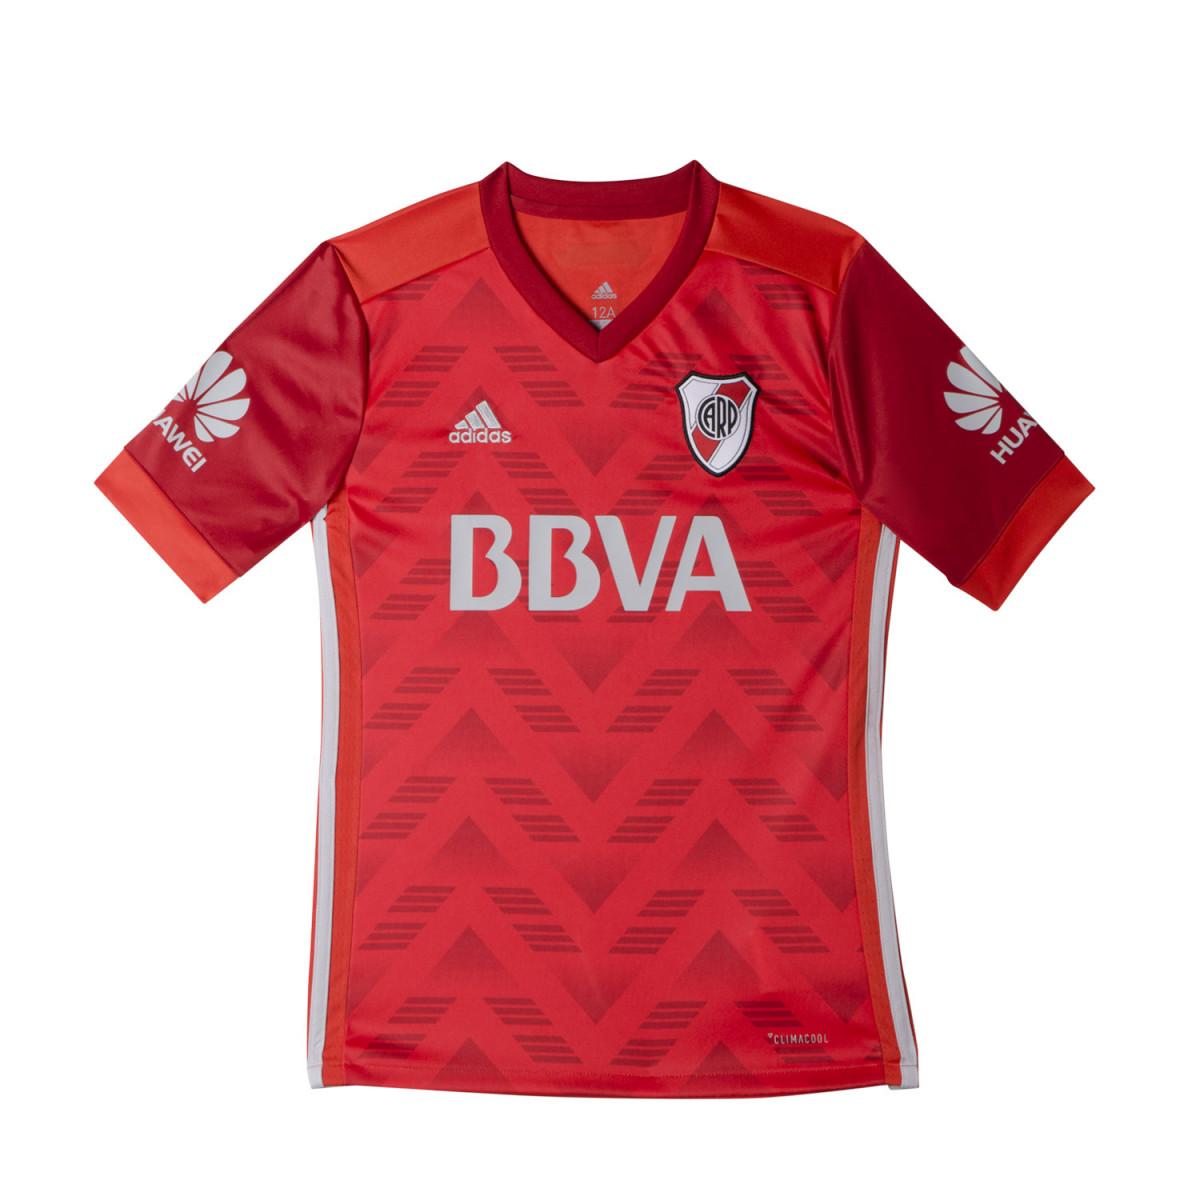 Camiseta Adidas River Plate 2017/2018